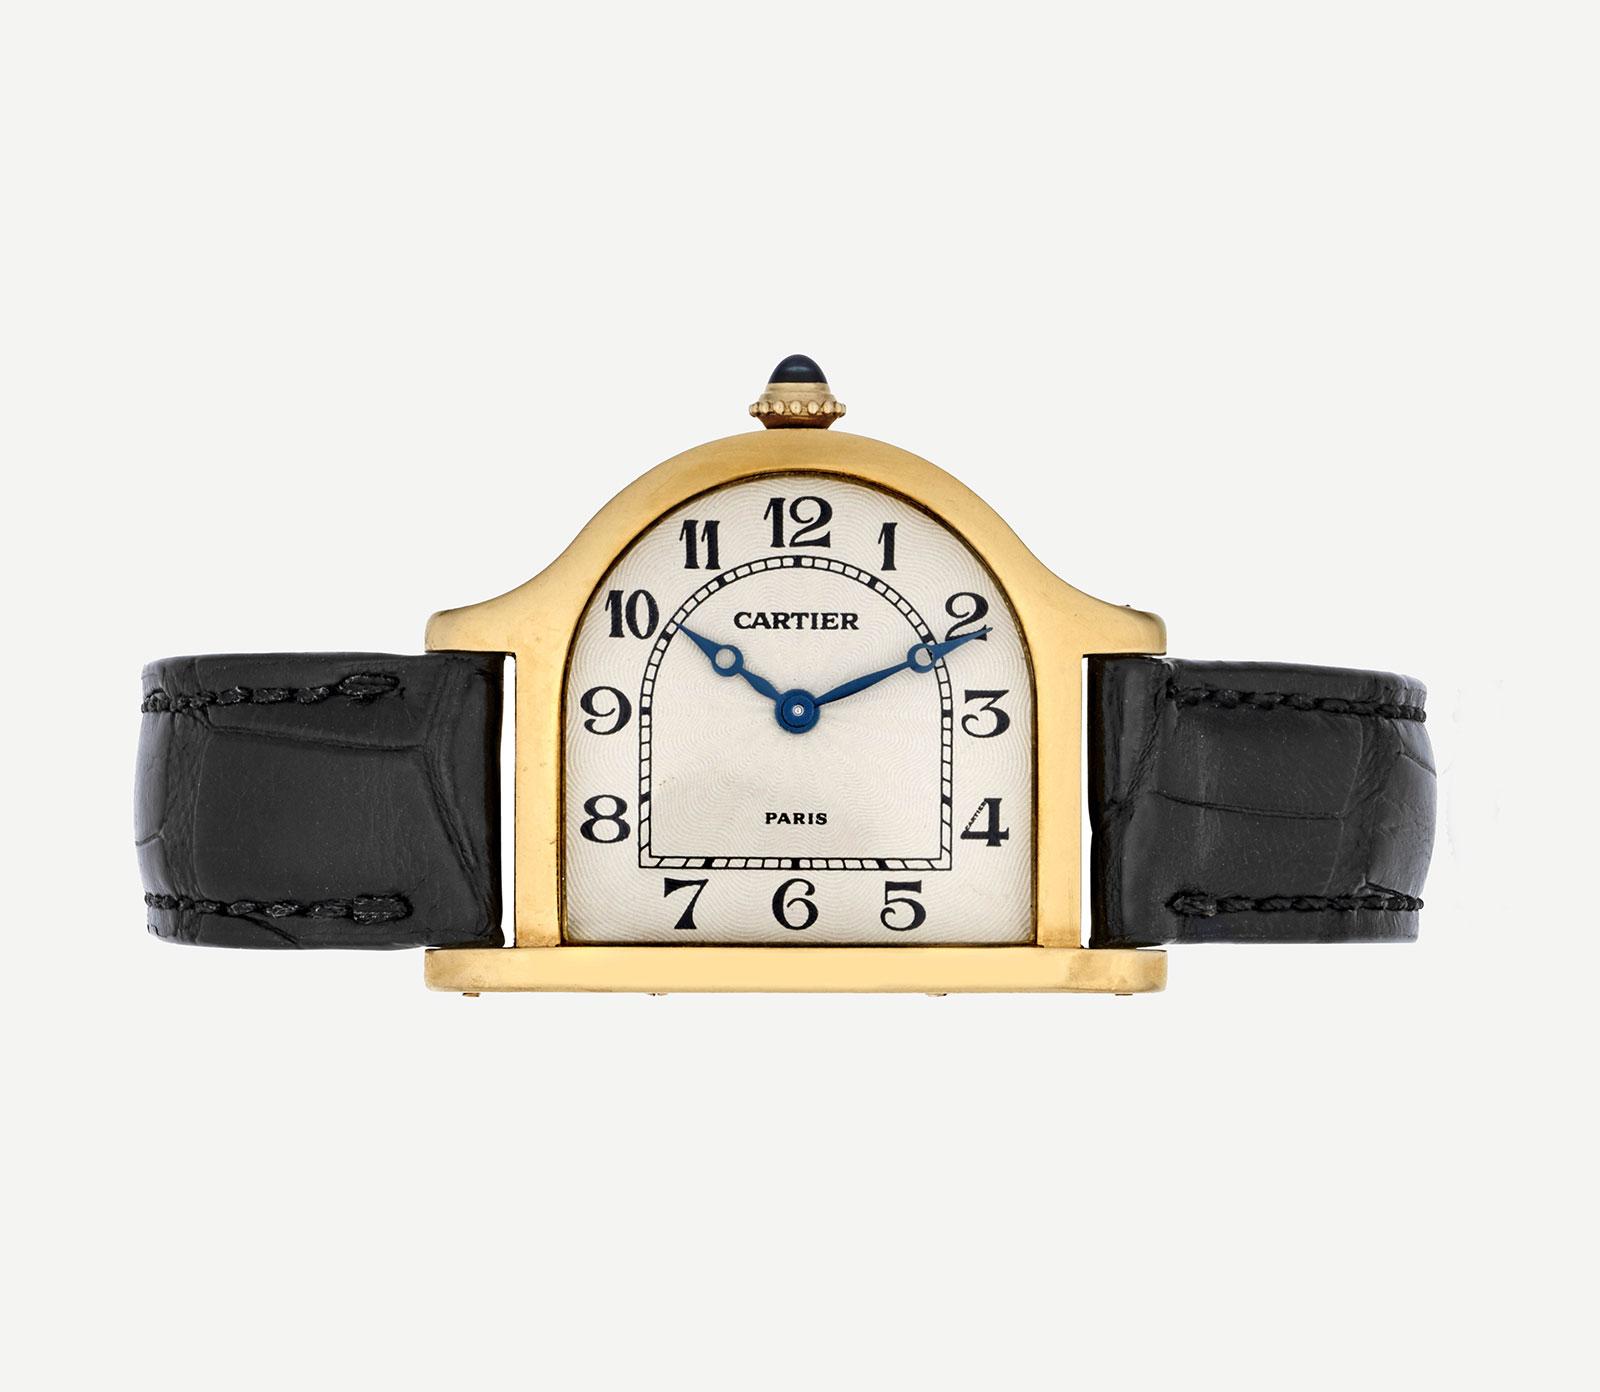 Christie's Online Cartier Cloche